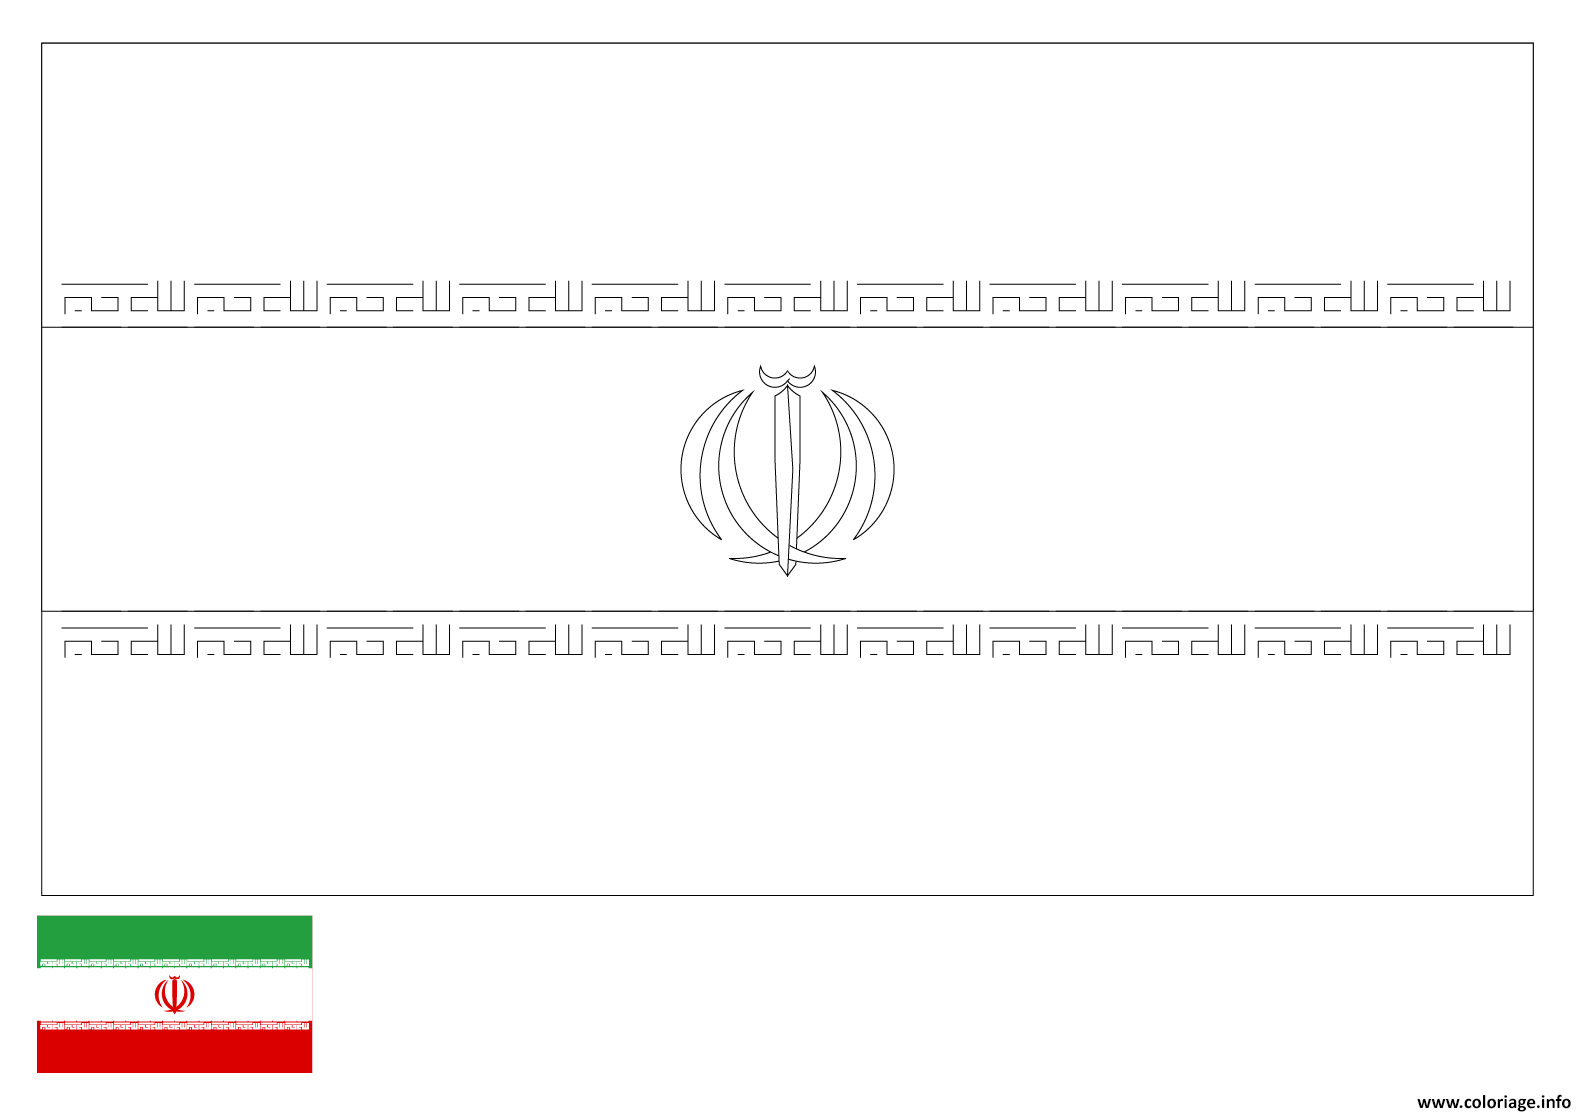 Dessin drapeau iran Coloriage Gratuit à Imprimer